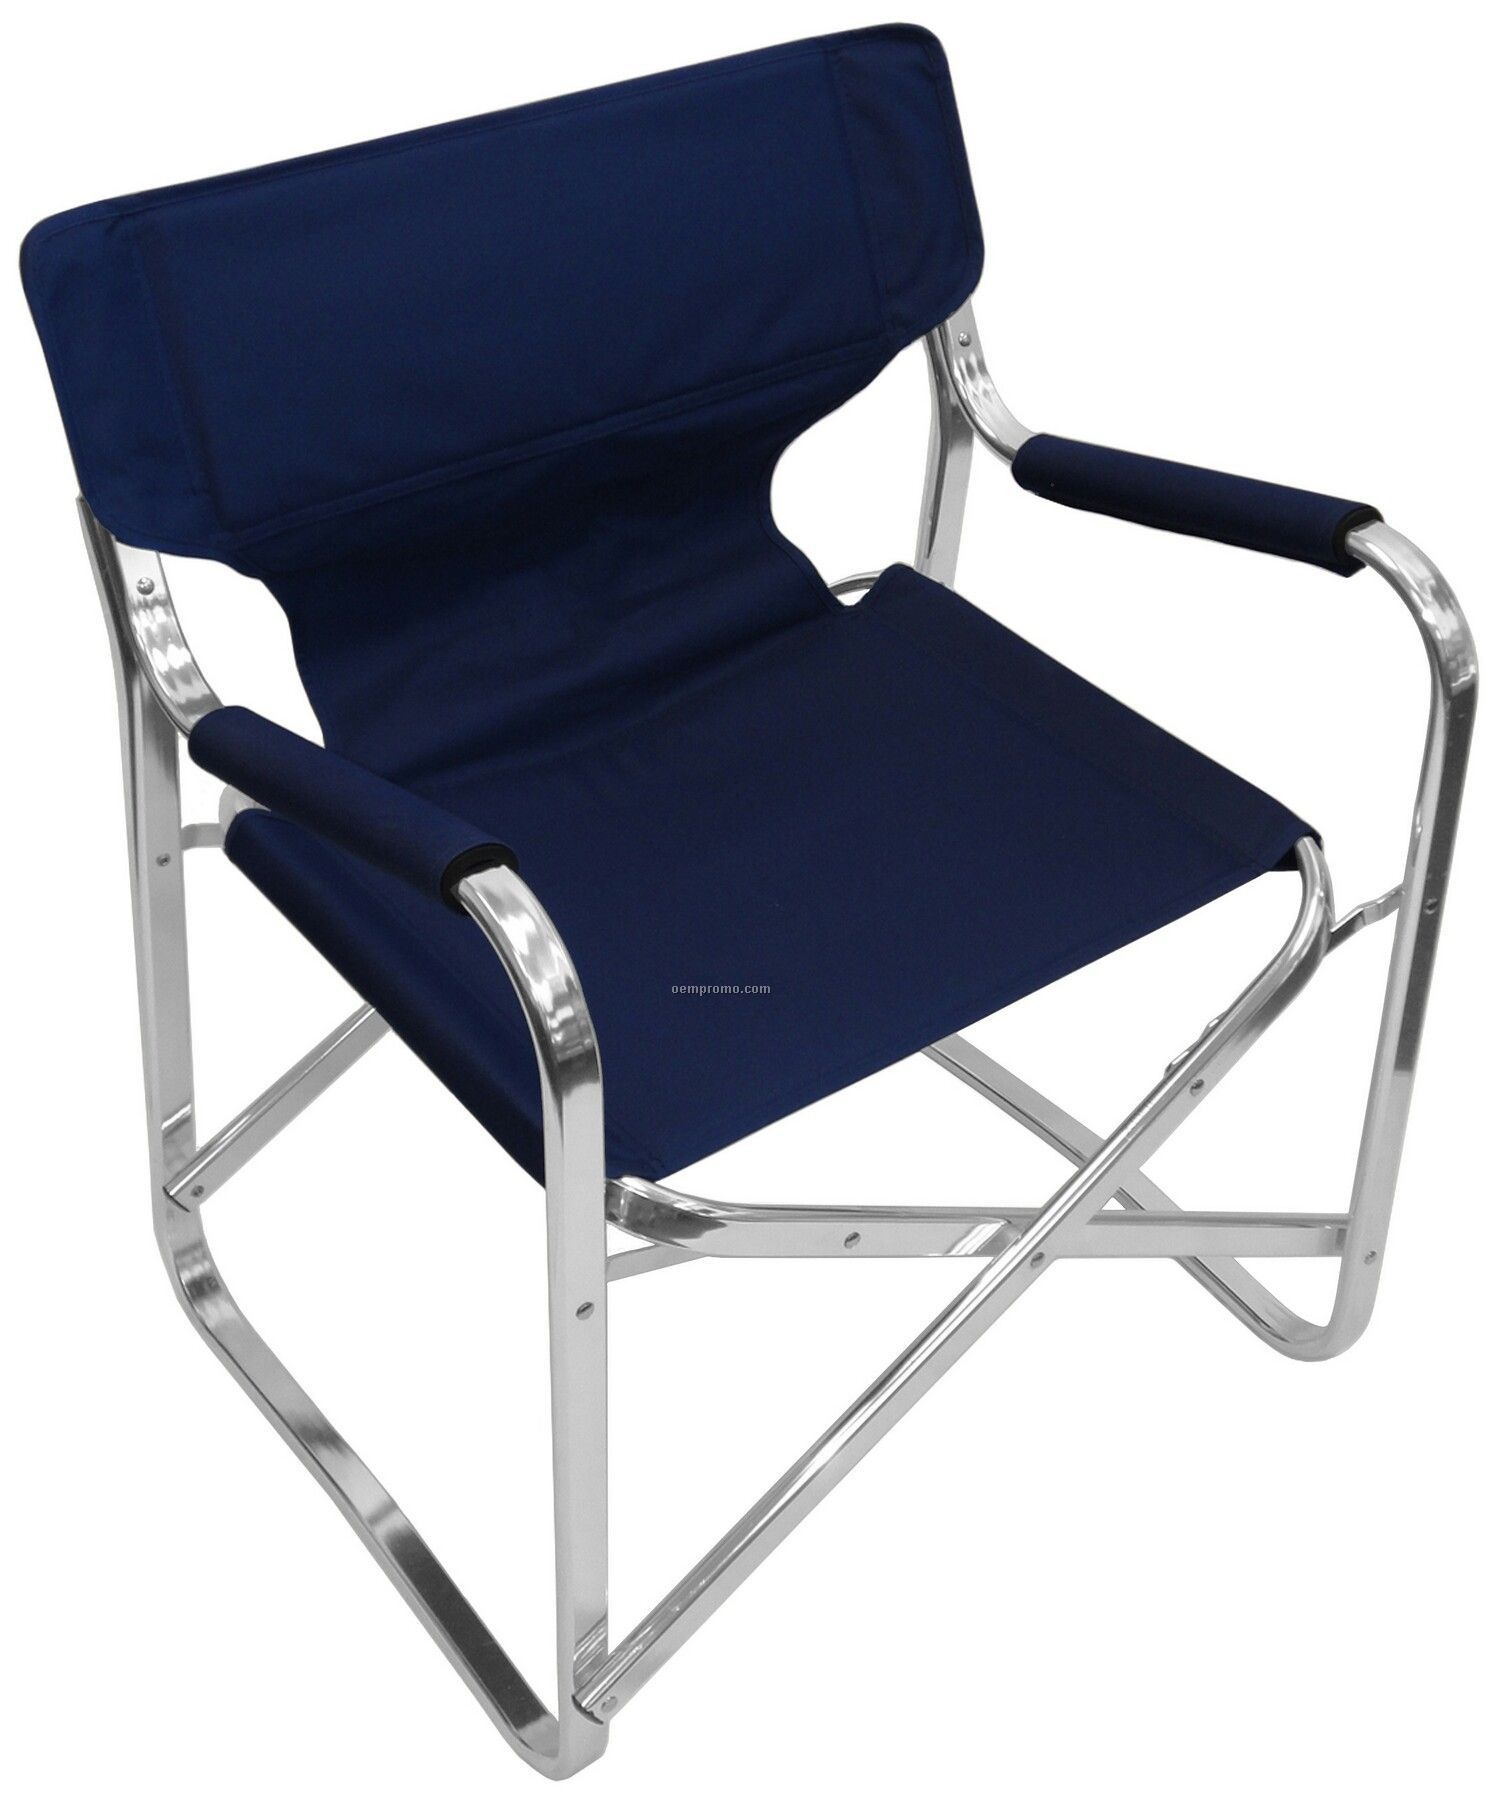 ChairsChina Wholesale ChairsPage 31